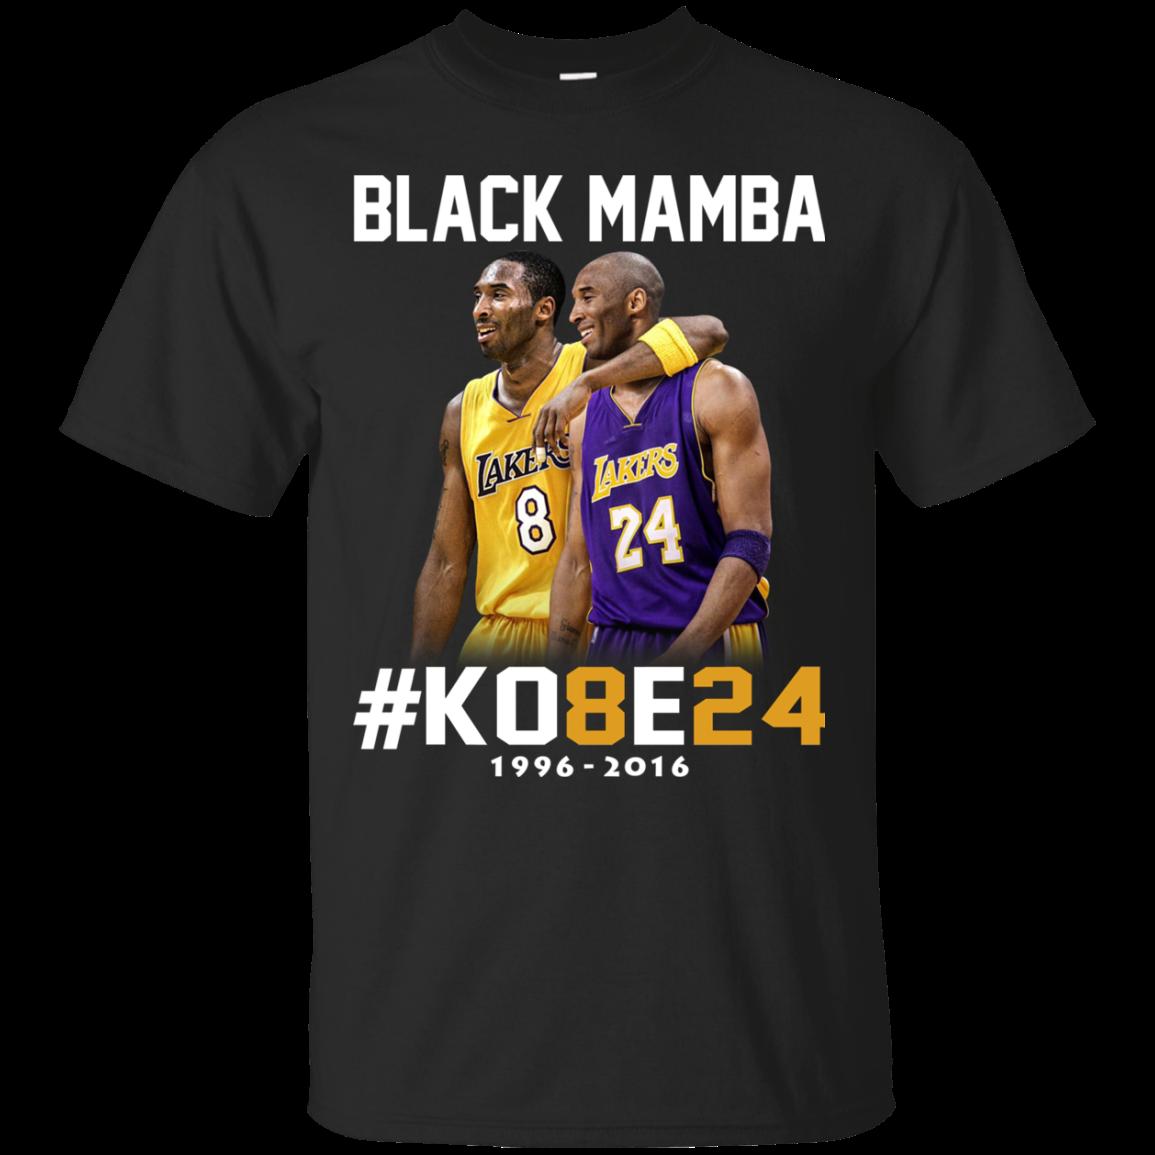 Kobe Bryant 24 Black Mamba Shirt, Hoodie, Tank | Allbluetees.com